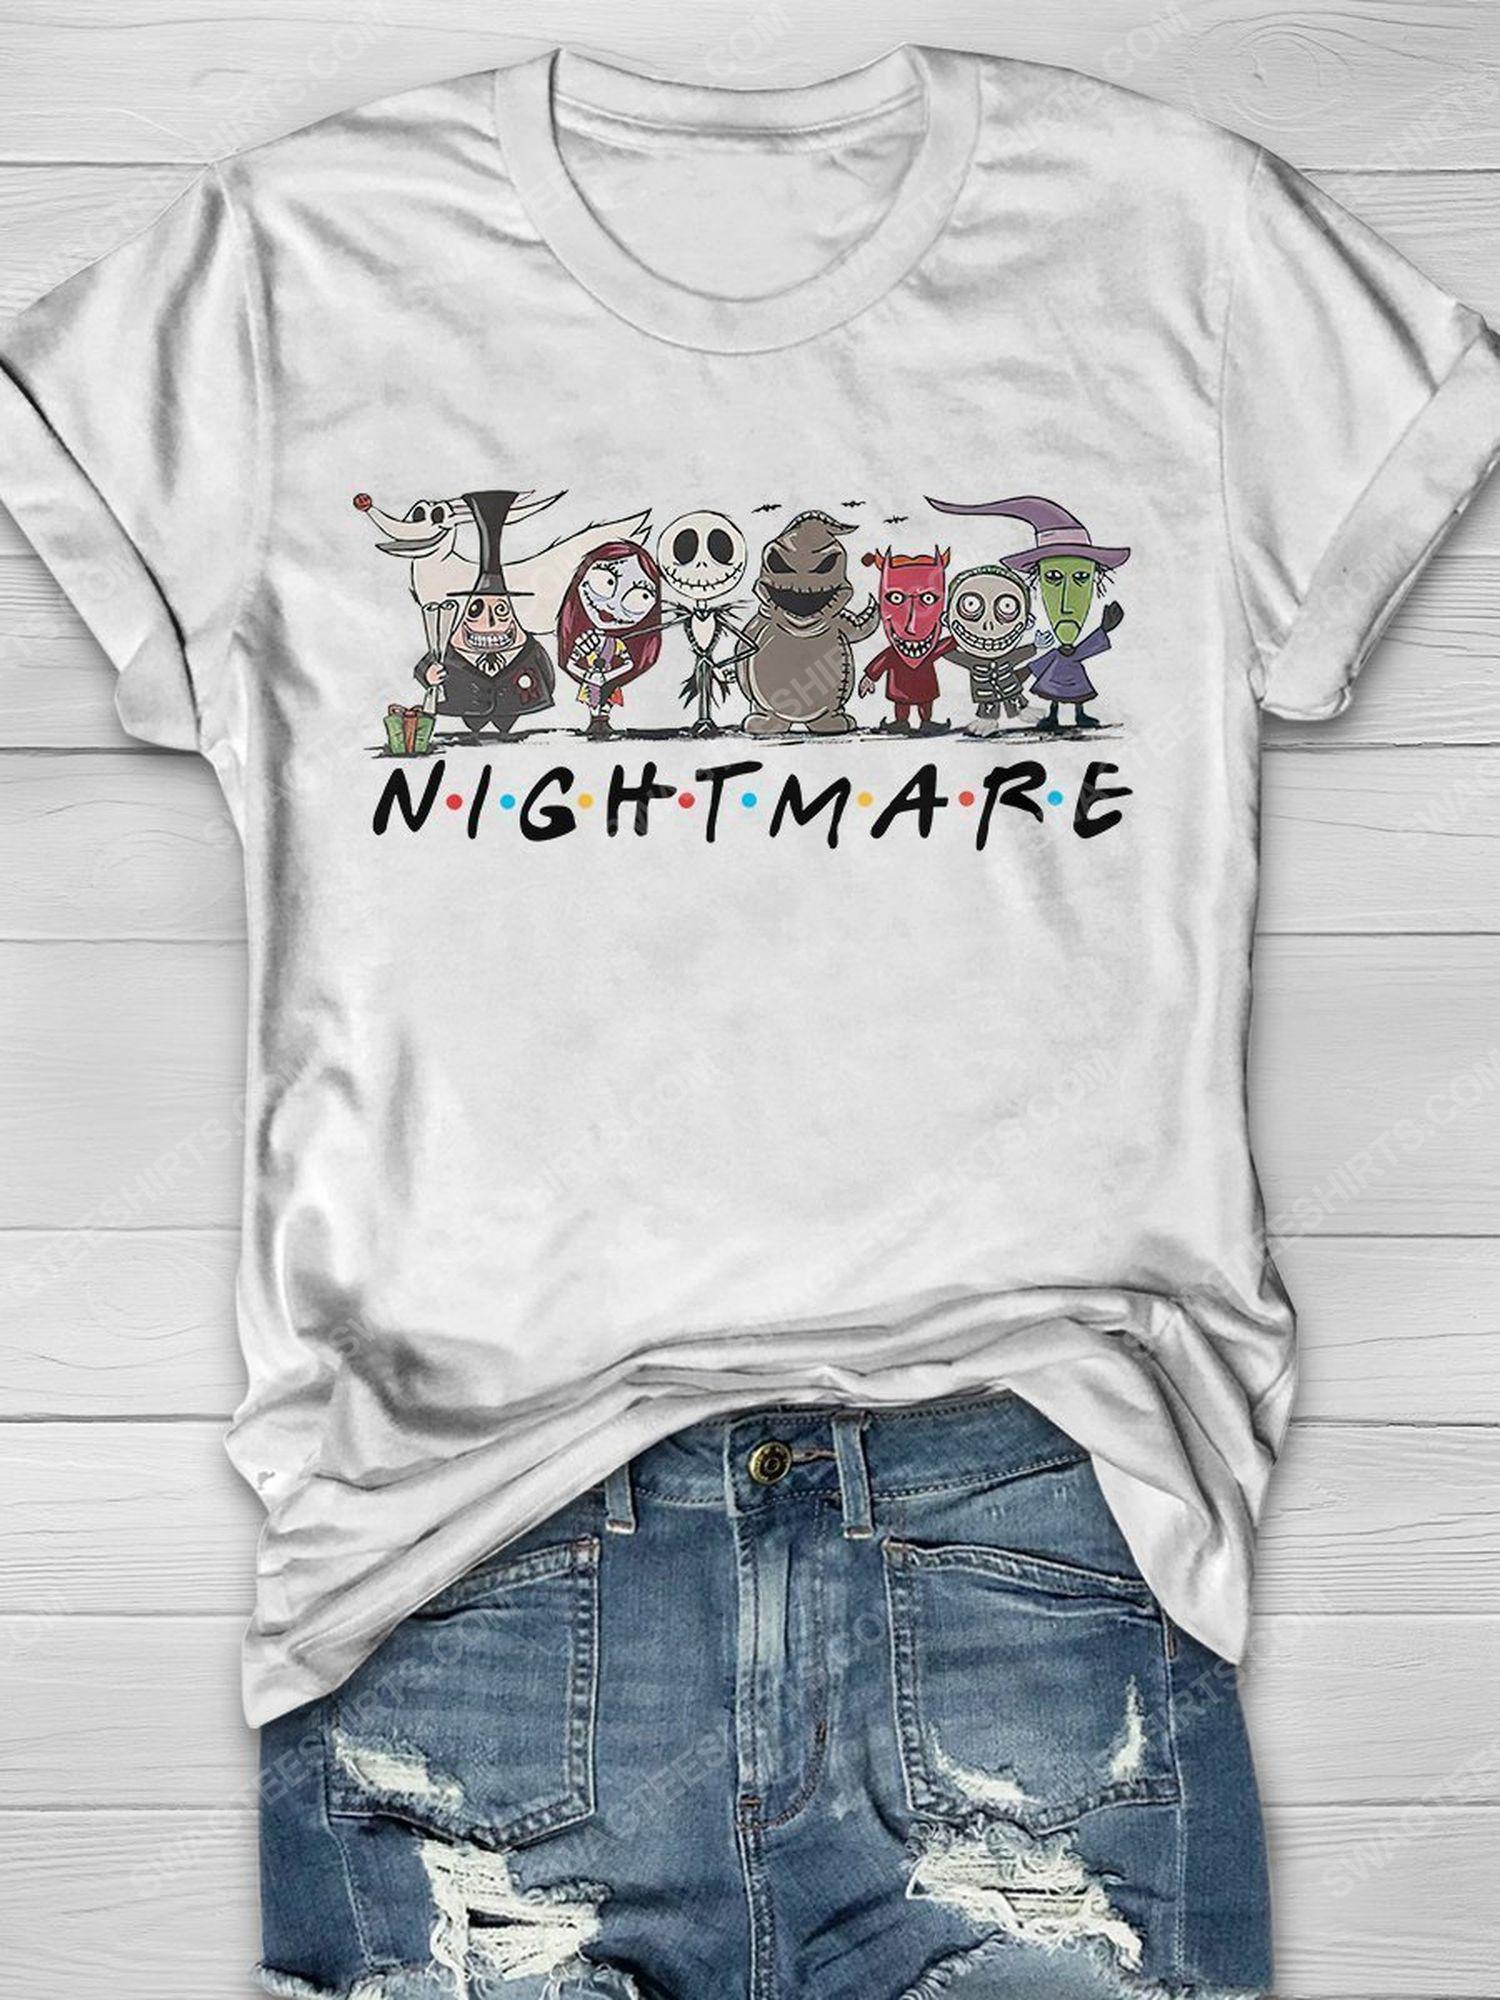 The nightmare before christmas friends tv show shirt 1 - Copy (3)